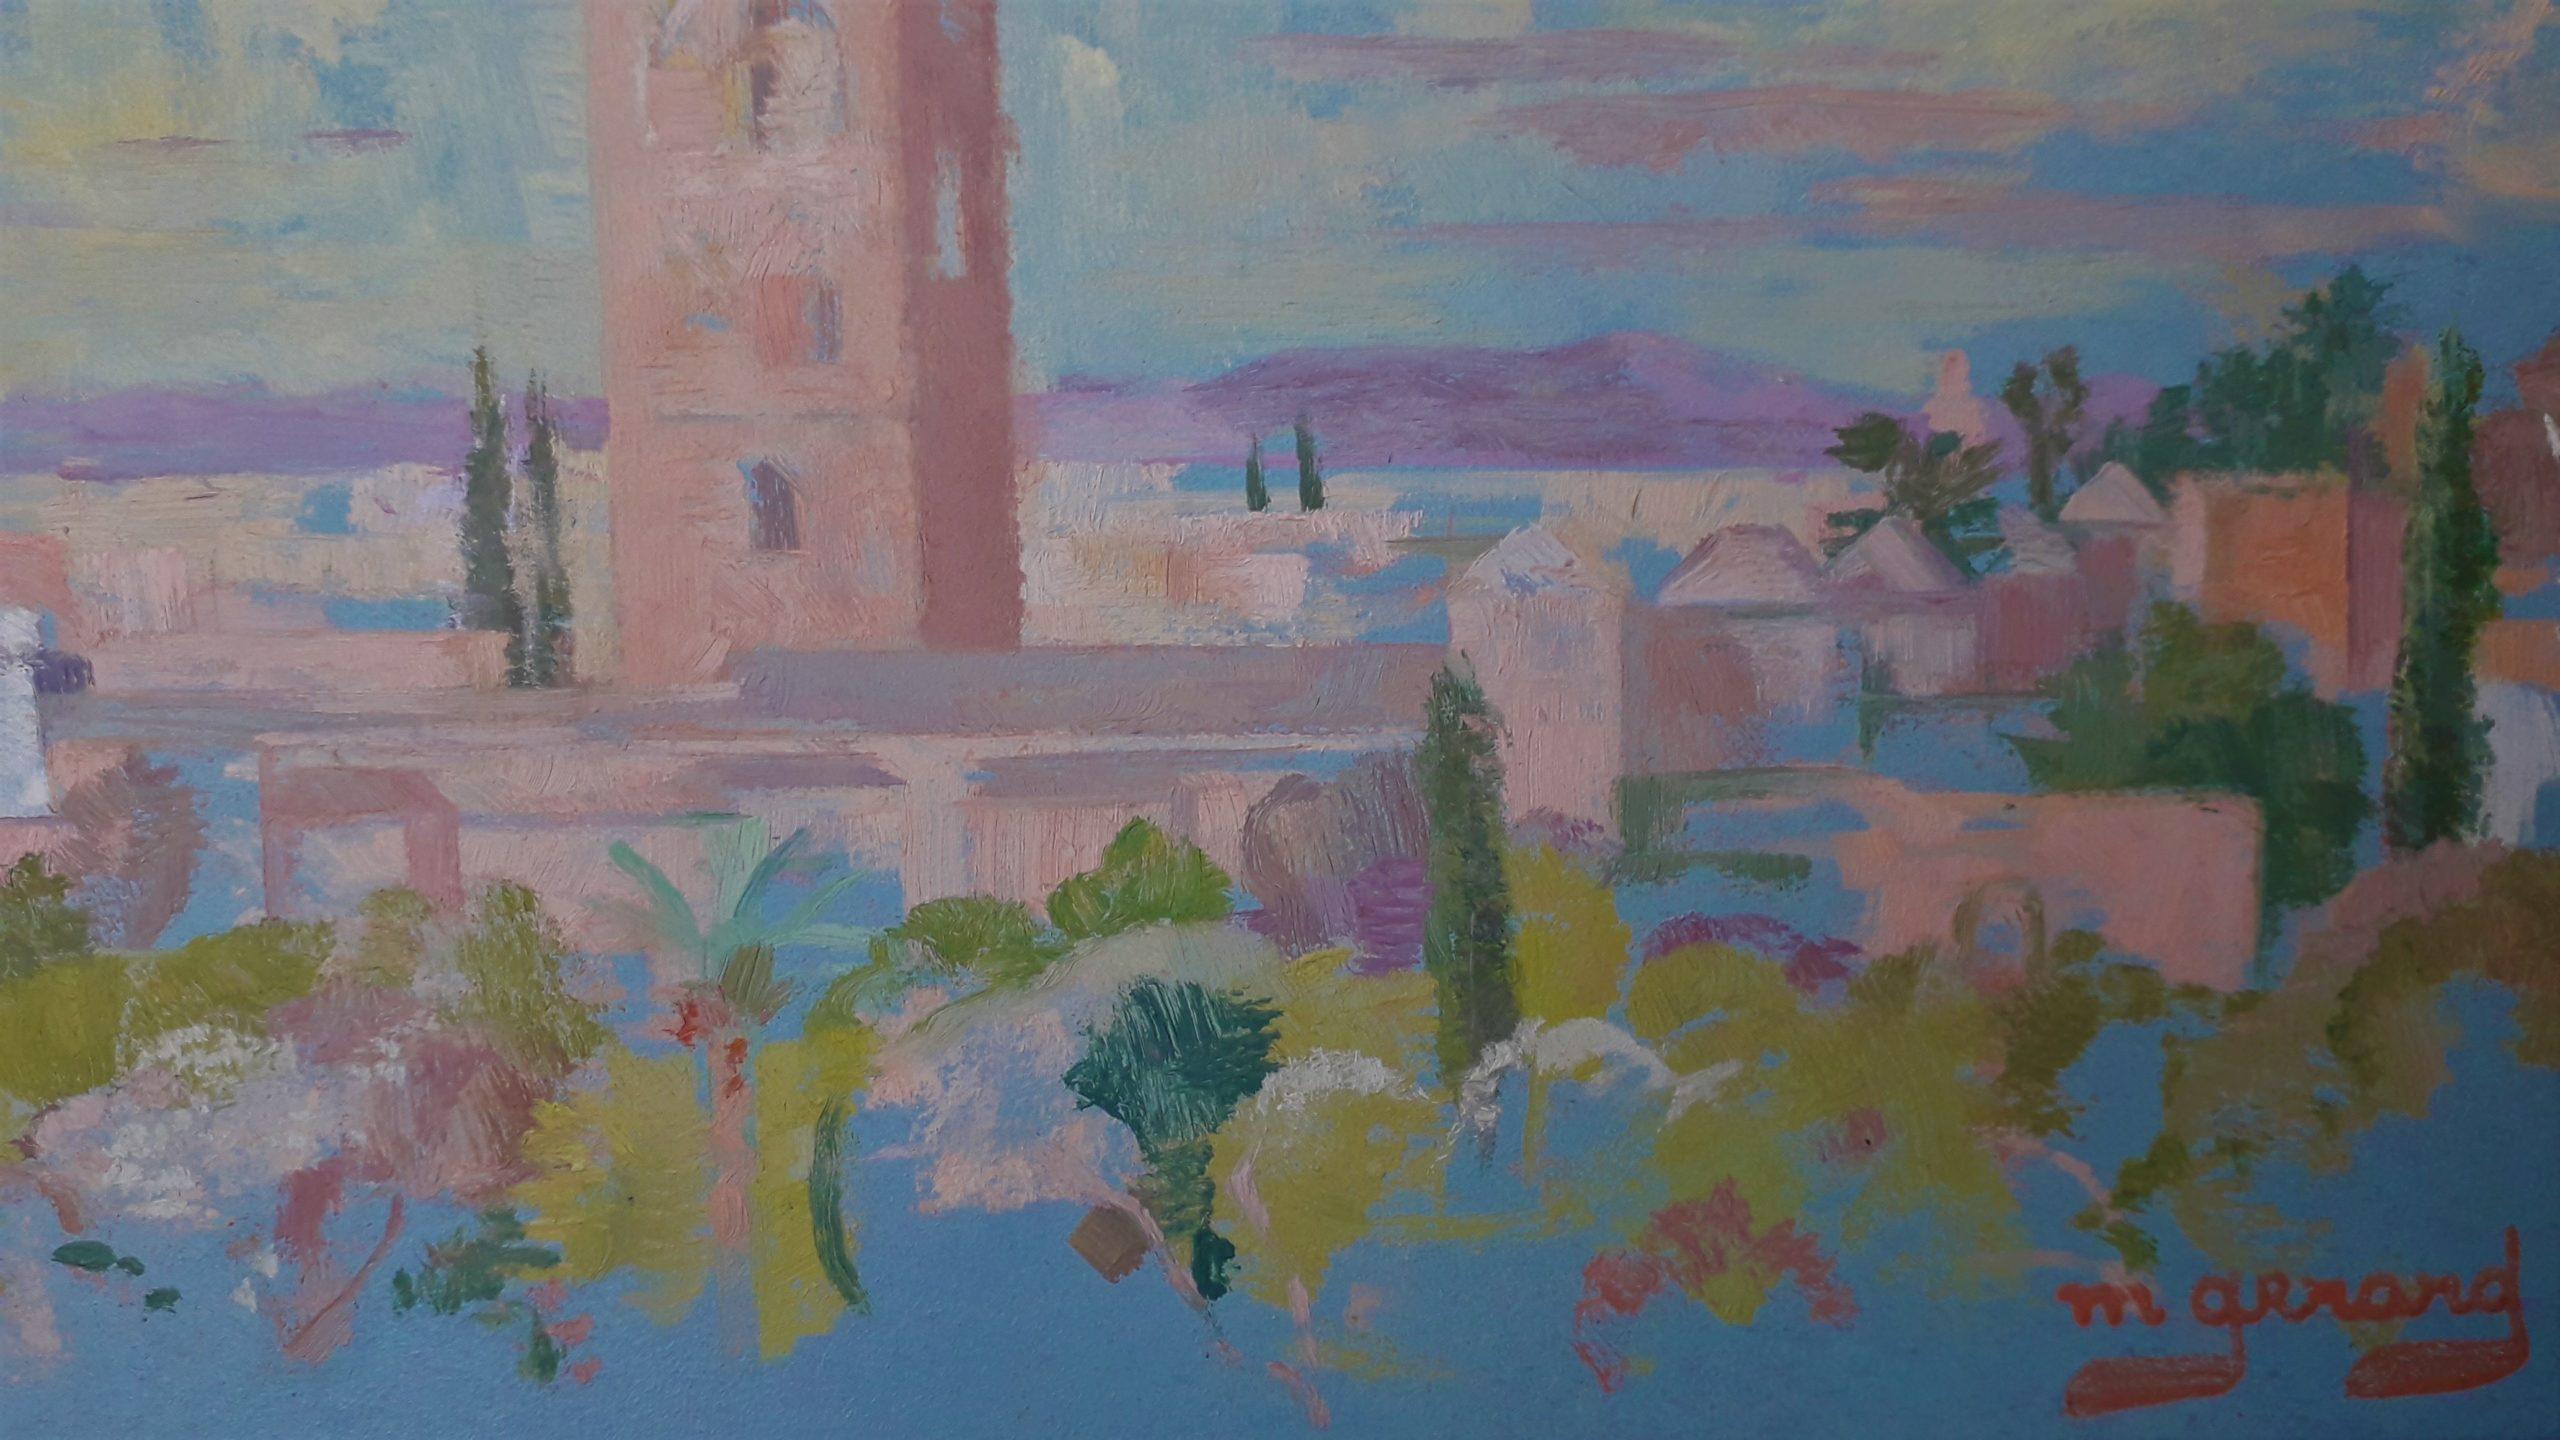 Gerard-Maud-vue-Koutoubia-Marrakech-hotel-Mamounia-1969-detail